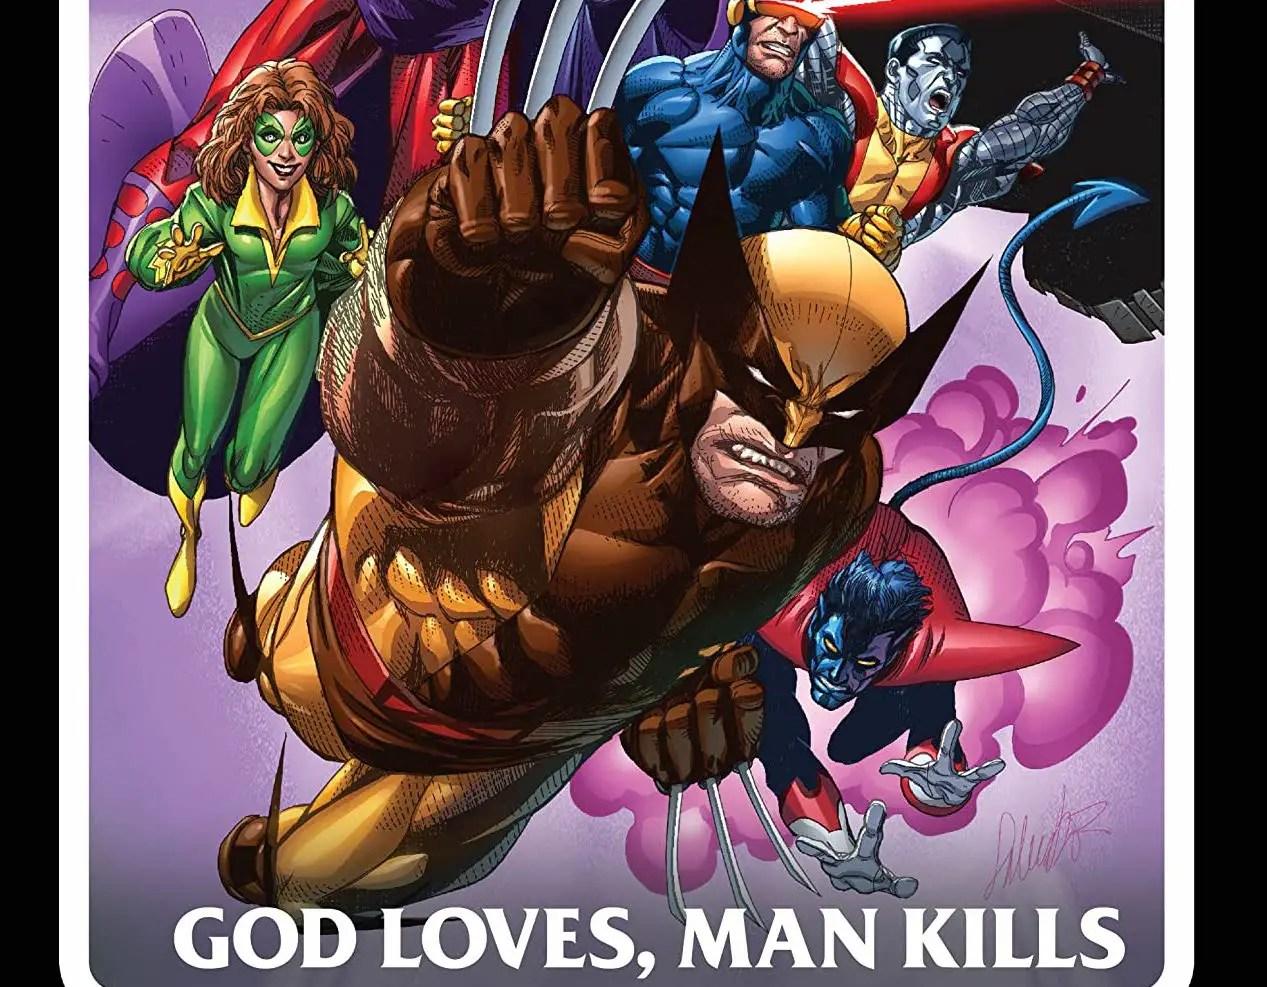 'X-Men: God Loves, Man Kills Extended Cut' #1 review